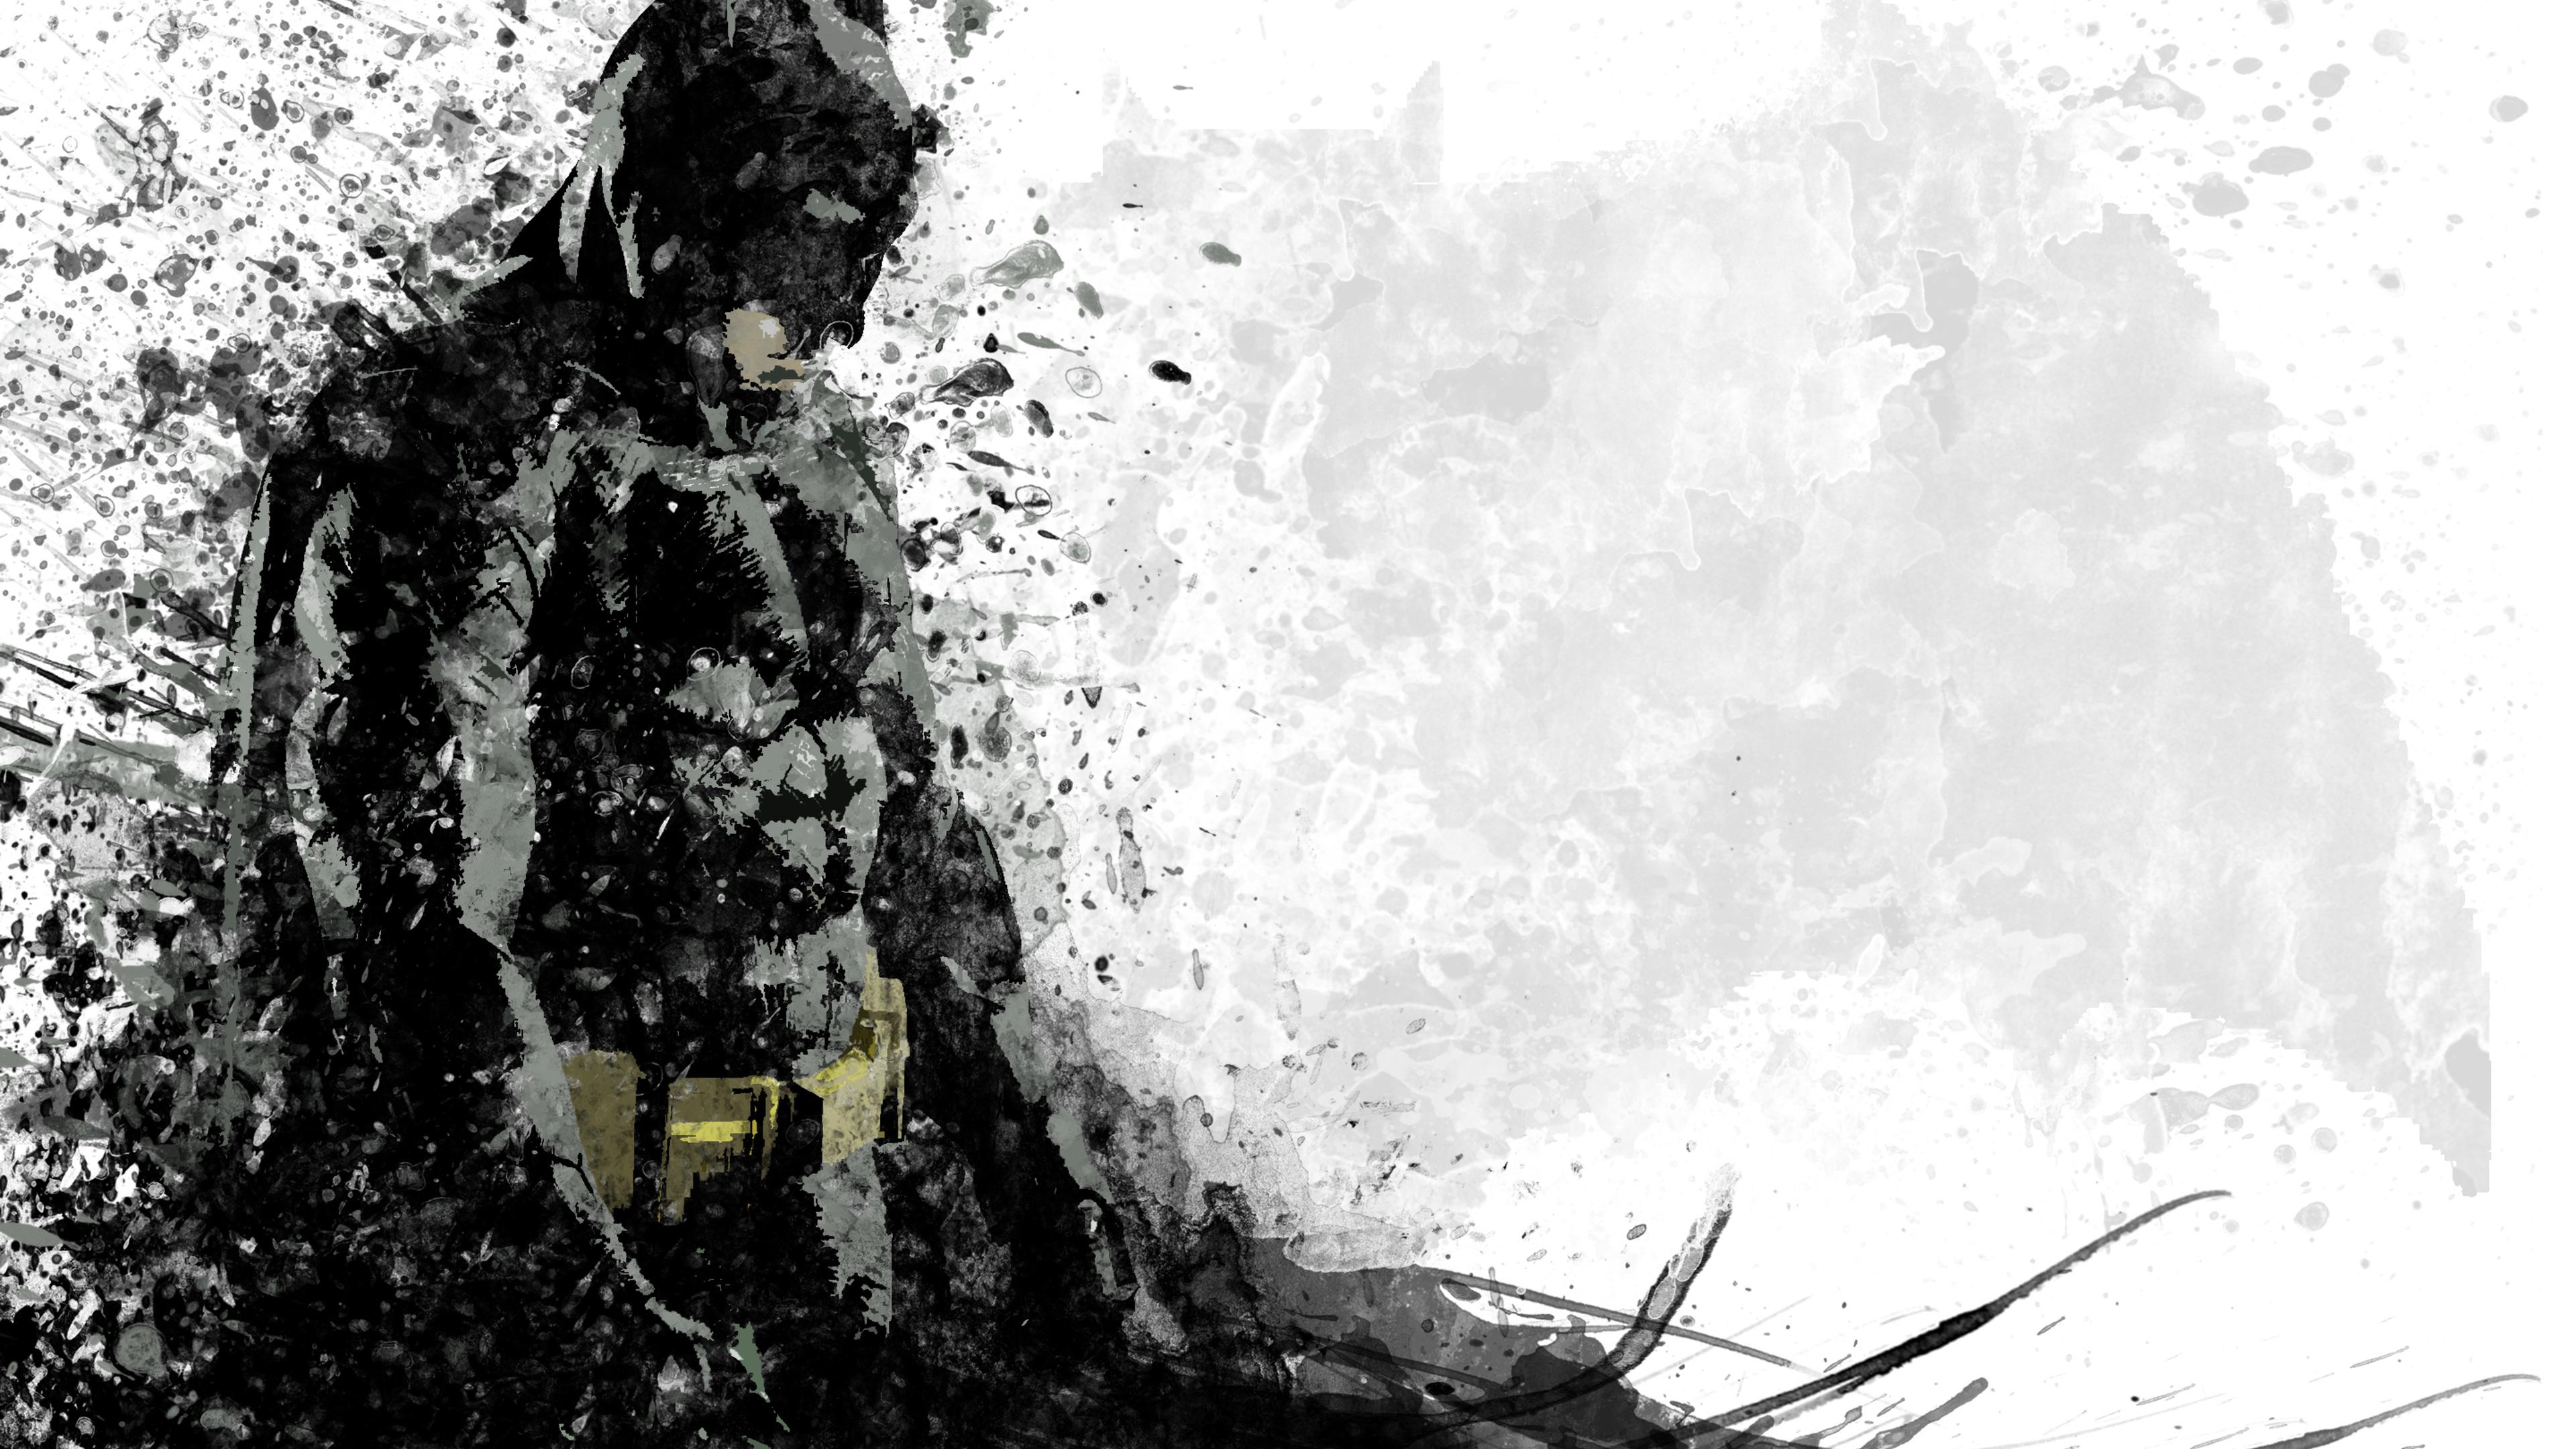 batman 5k 1536522571 - Batman 5k - superheroes wallpapers, hd-wallpapers, deviantart wallpapers, batman wallpapers, artwork wallpapers, artist wallpapers, 5k wallpapers, 4k-wallpapers